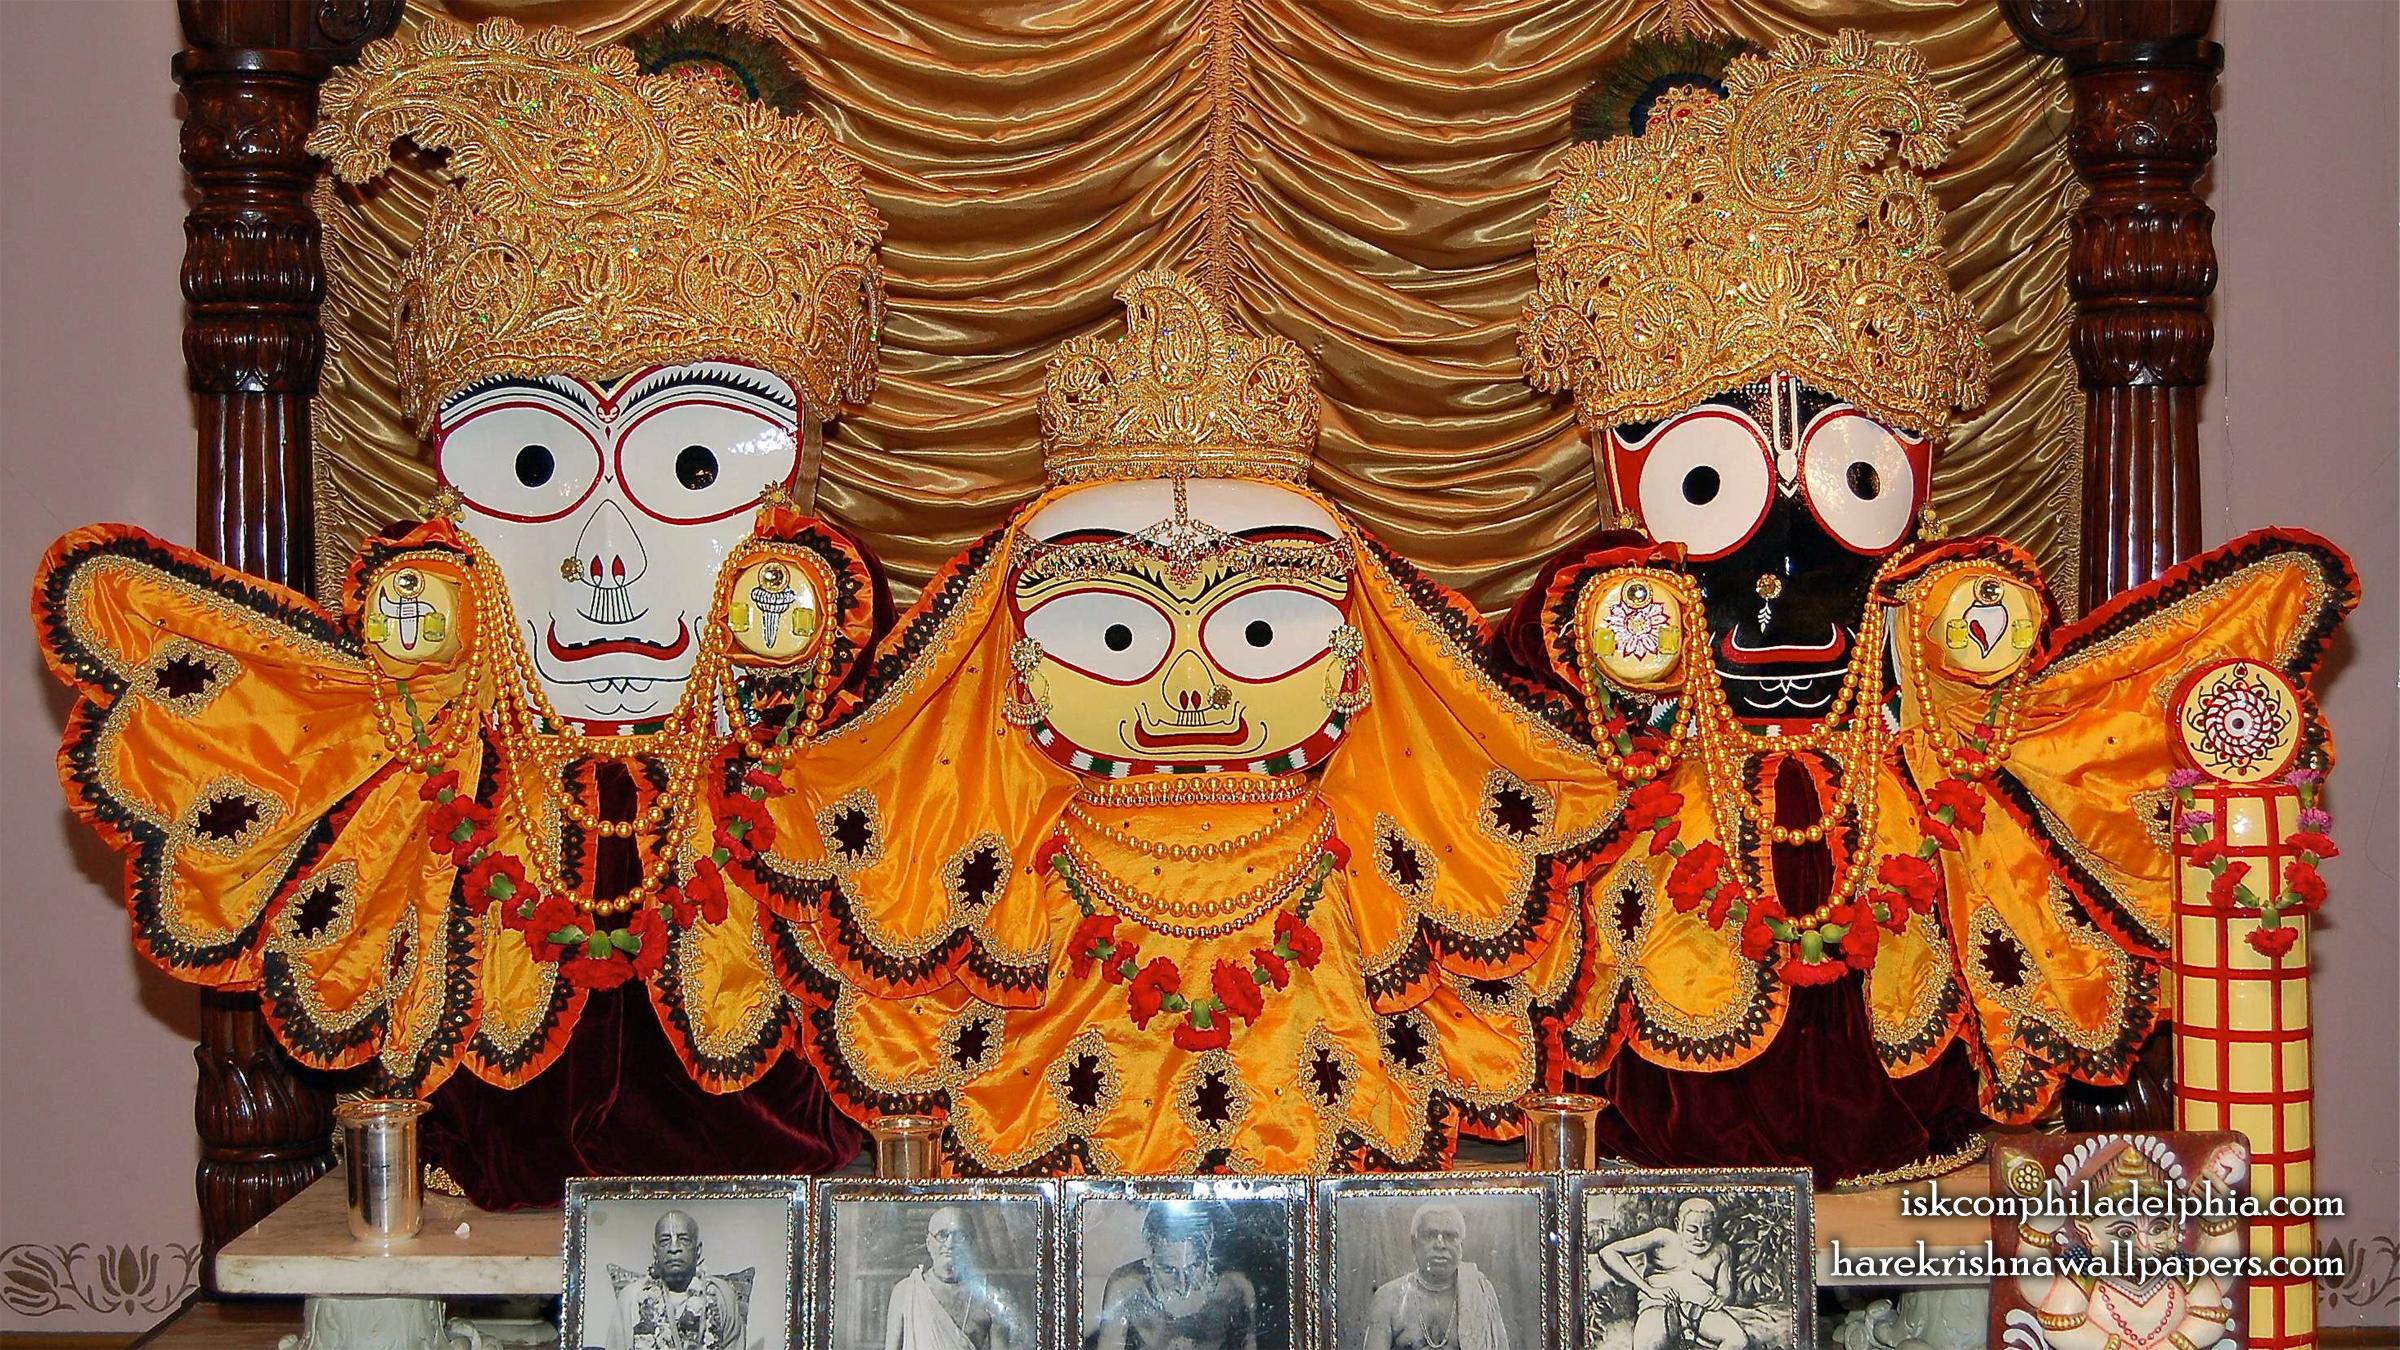 Jagannath Baladeva Subhadra Wallpaper (003) Size 2400x1350 Download